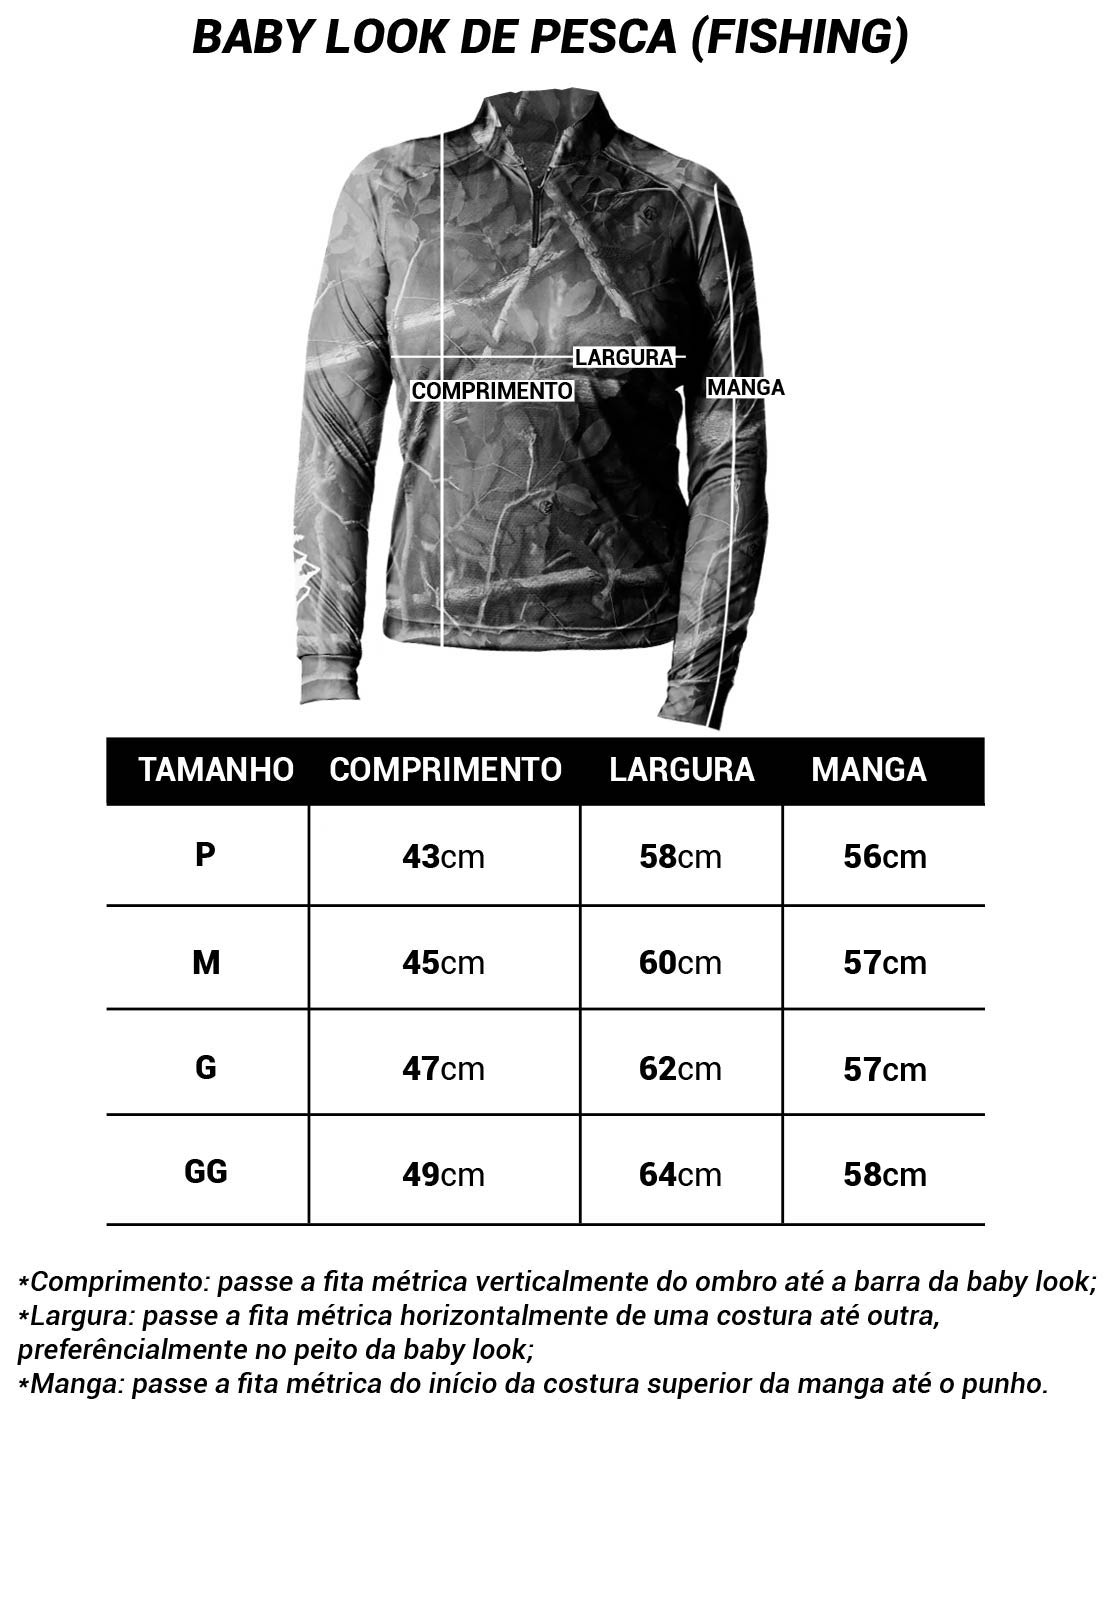 CAMISA DE PESCA FISH DOURADO 01 FEMININA + BANDANA GRÁTIS  - REAL HUNTER OUTDOORS